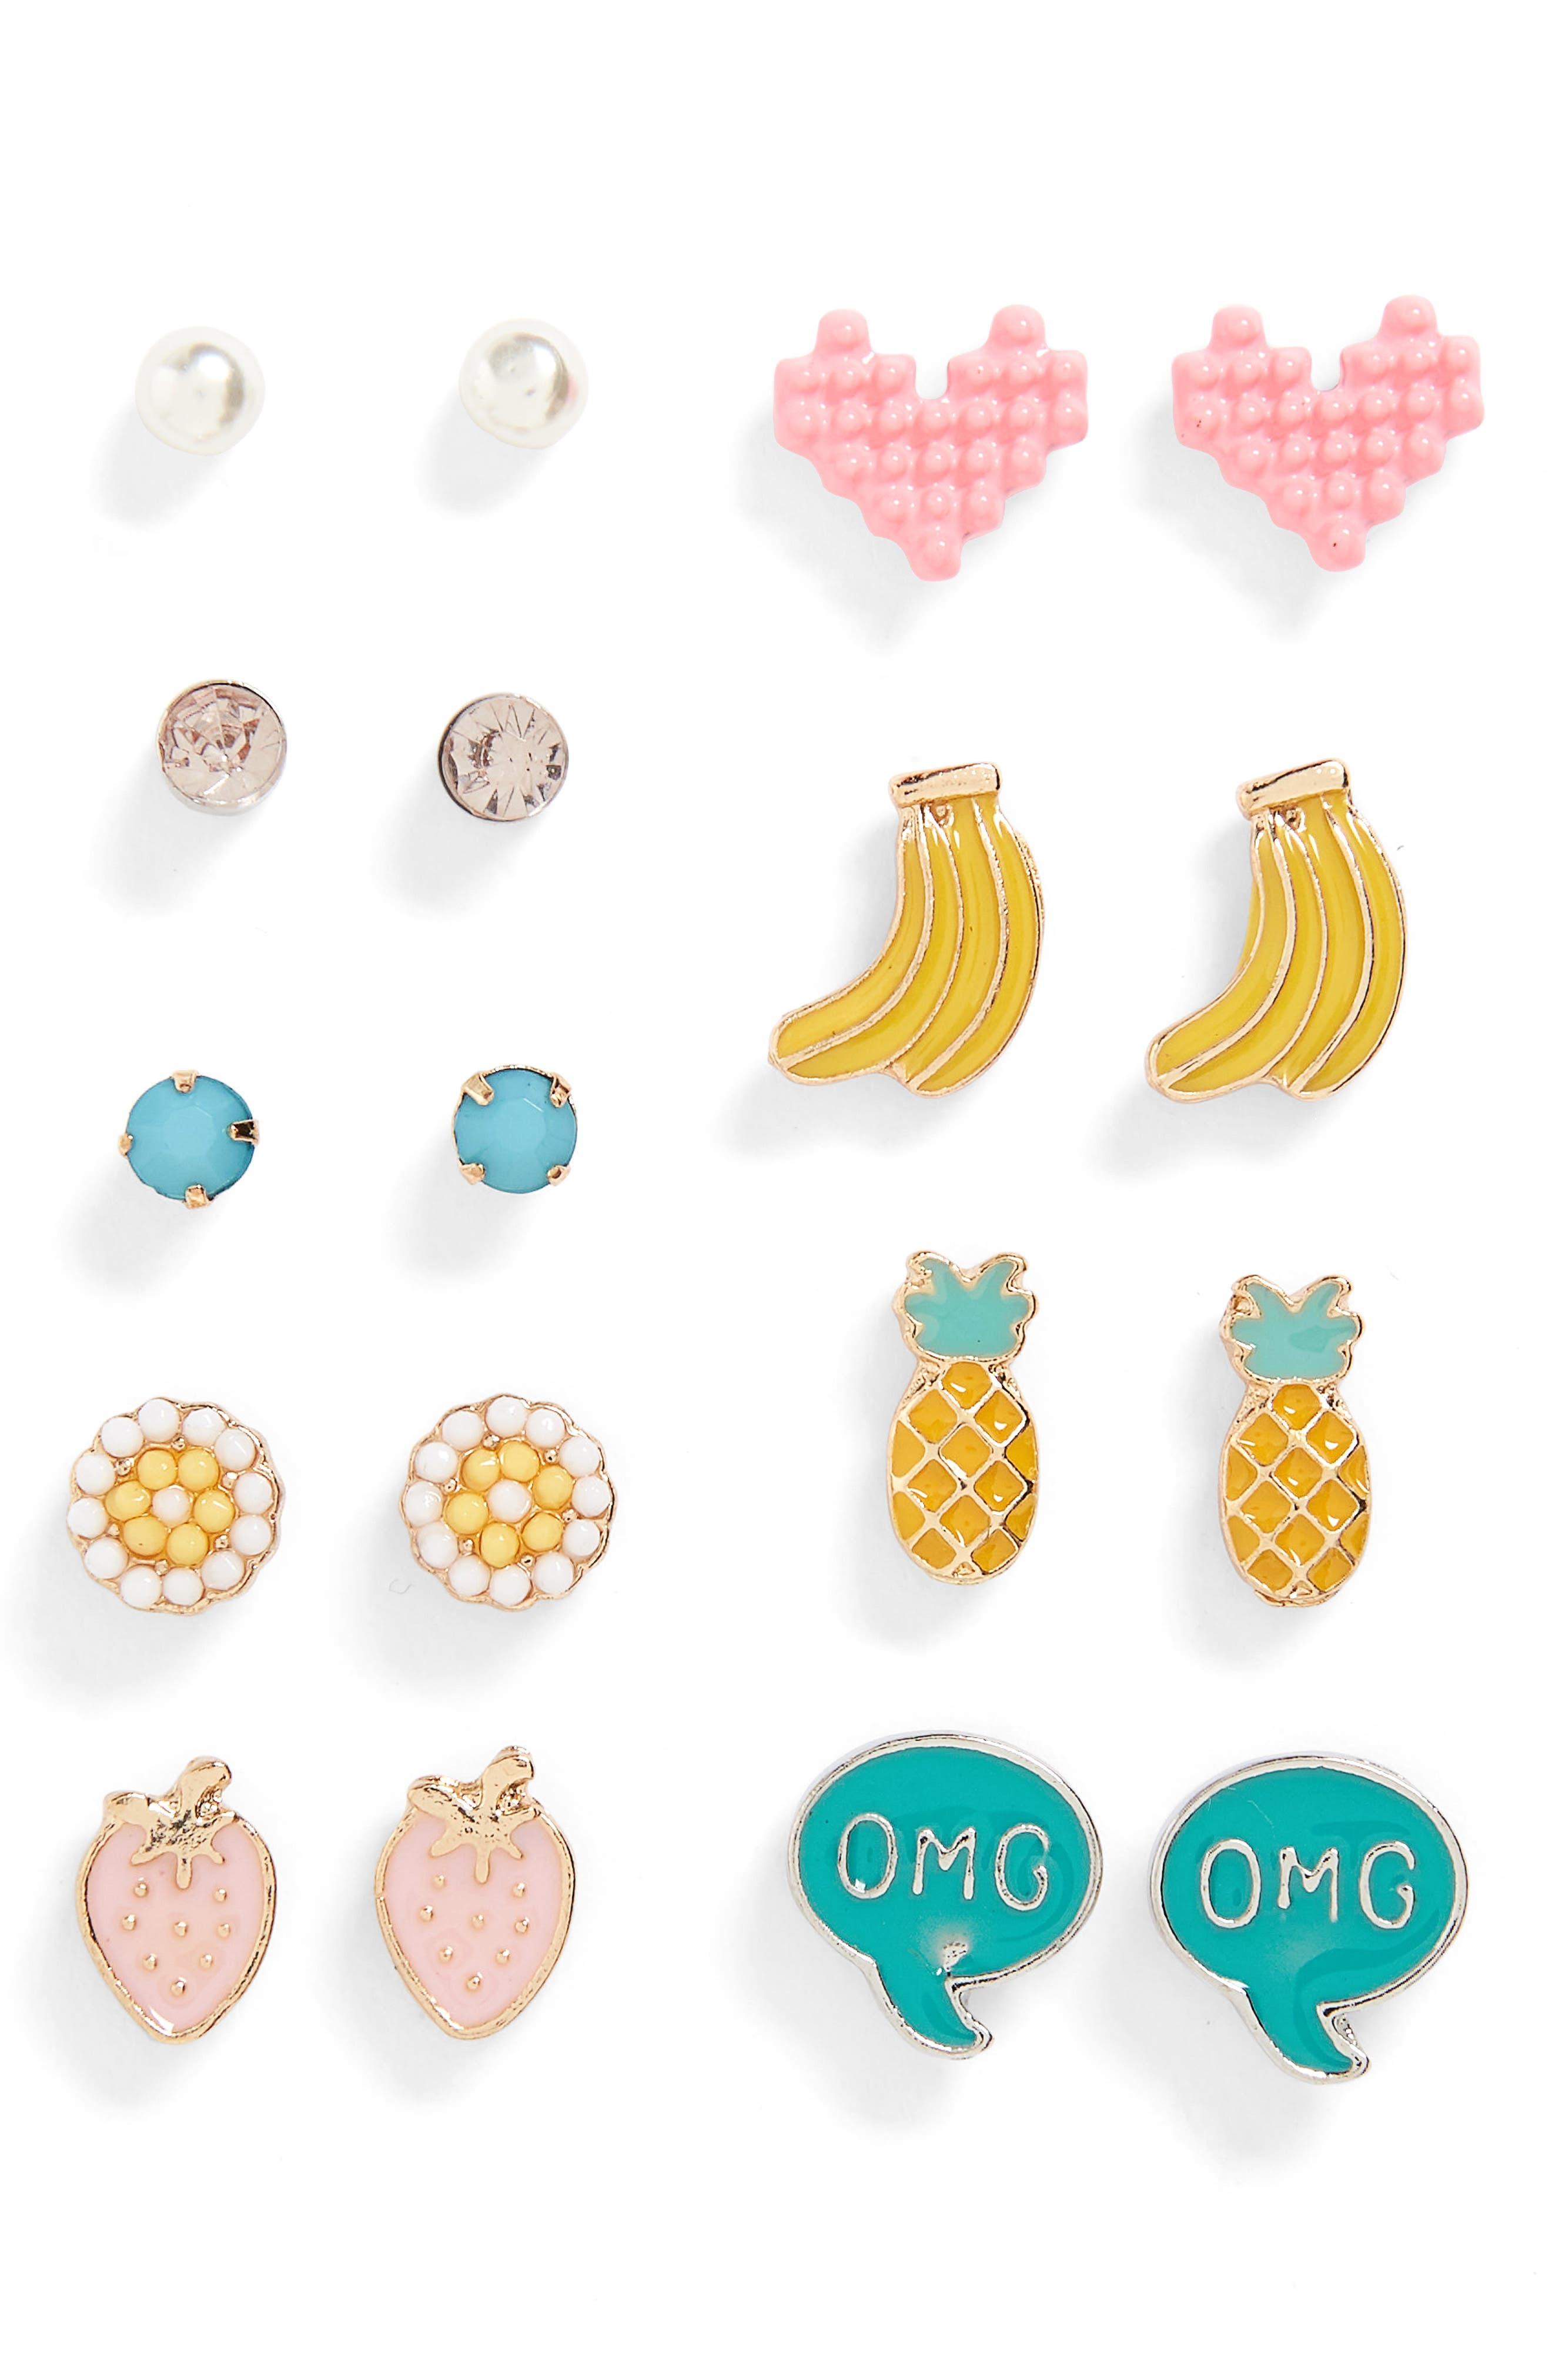 8-Pack Stud Earrings,                             Main thumbnail 1, color,                             651